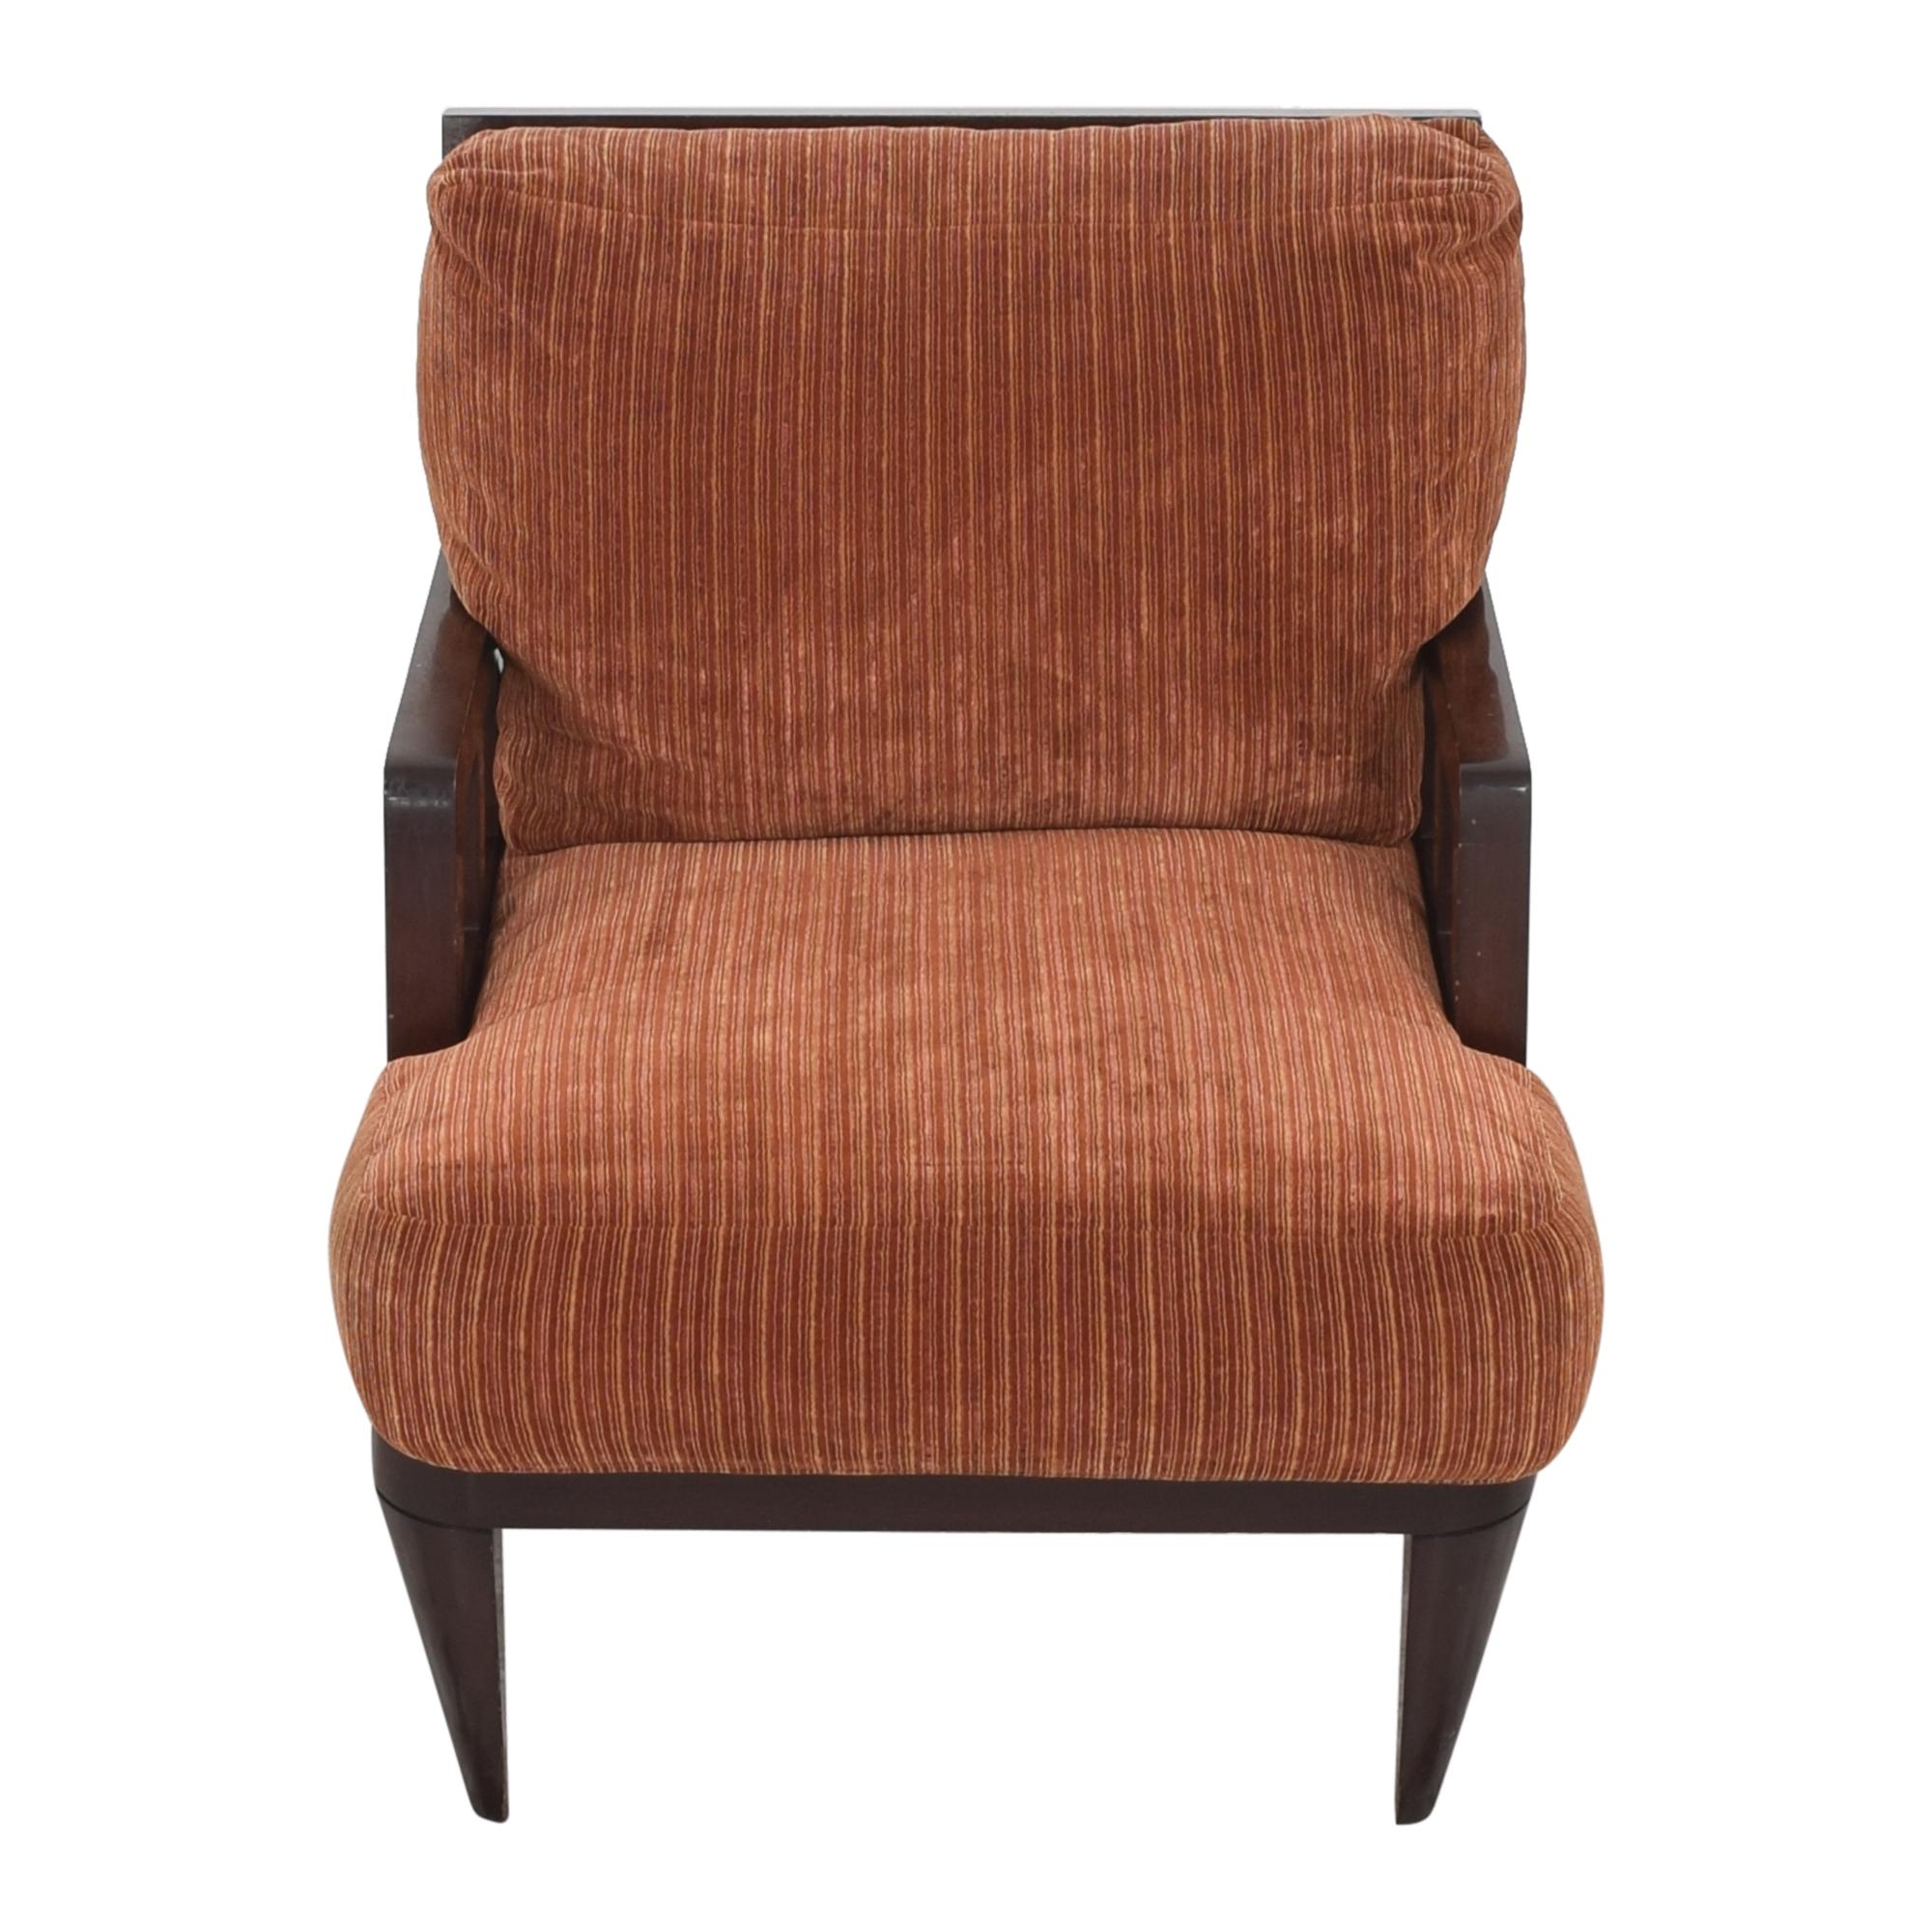 Berman   Rosetti Berman   Rosetti Fretwork Lounge Armchair brown & red